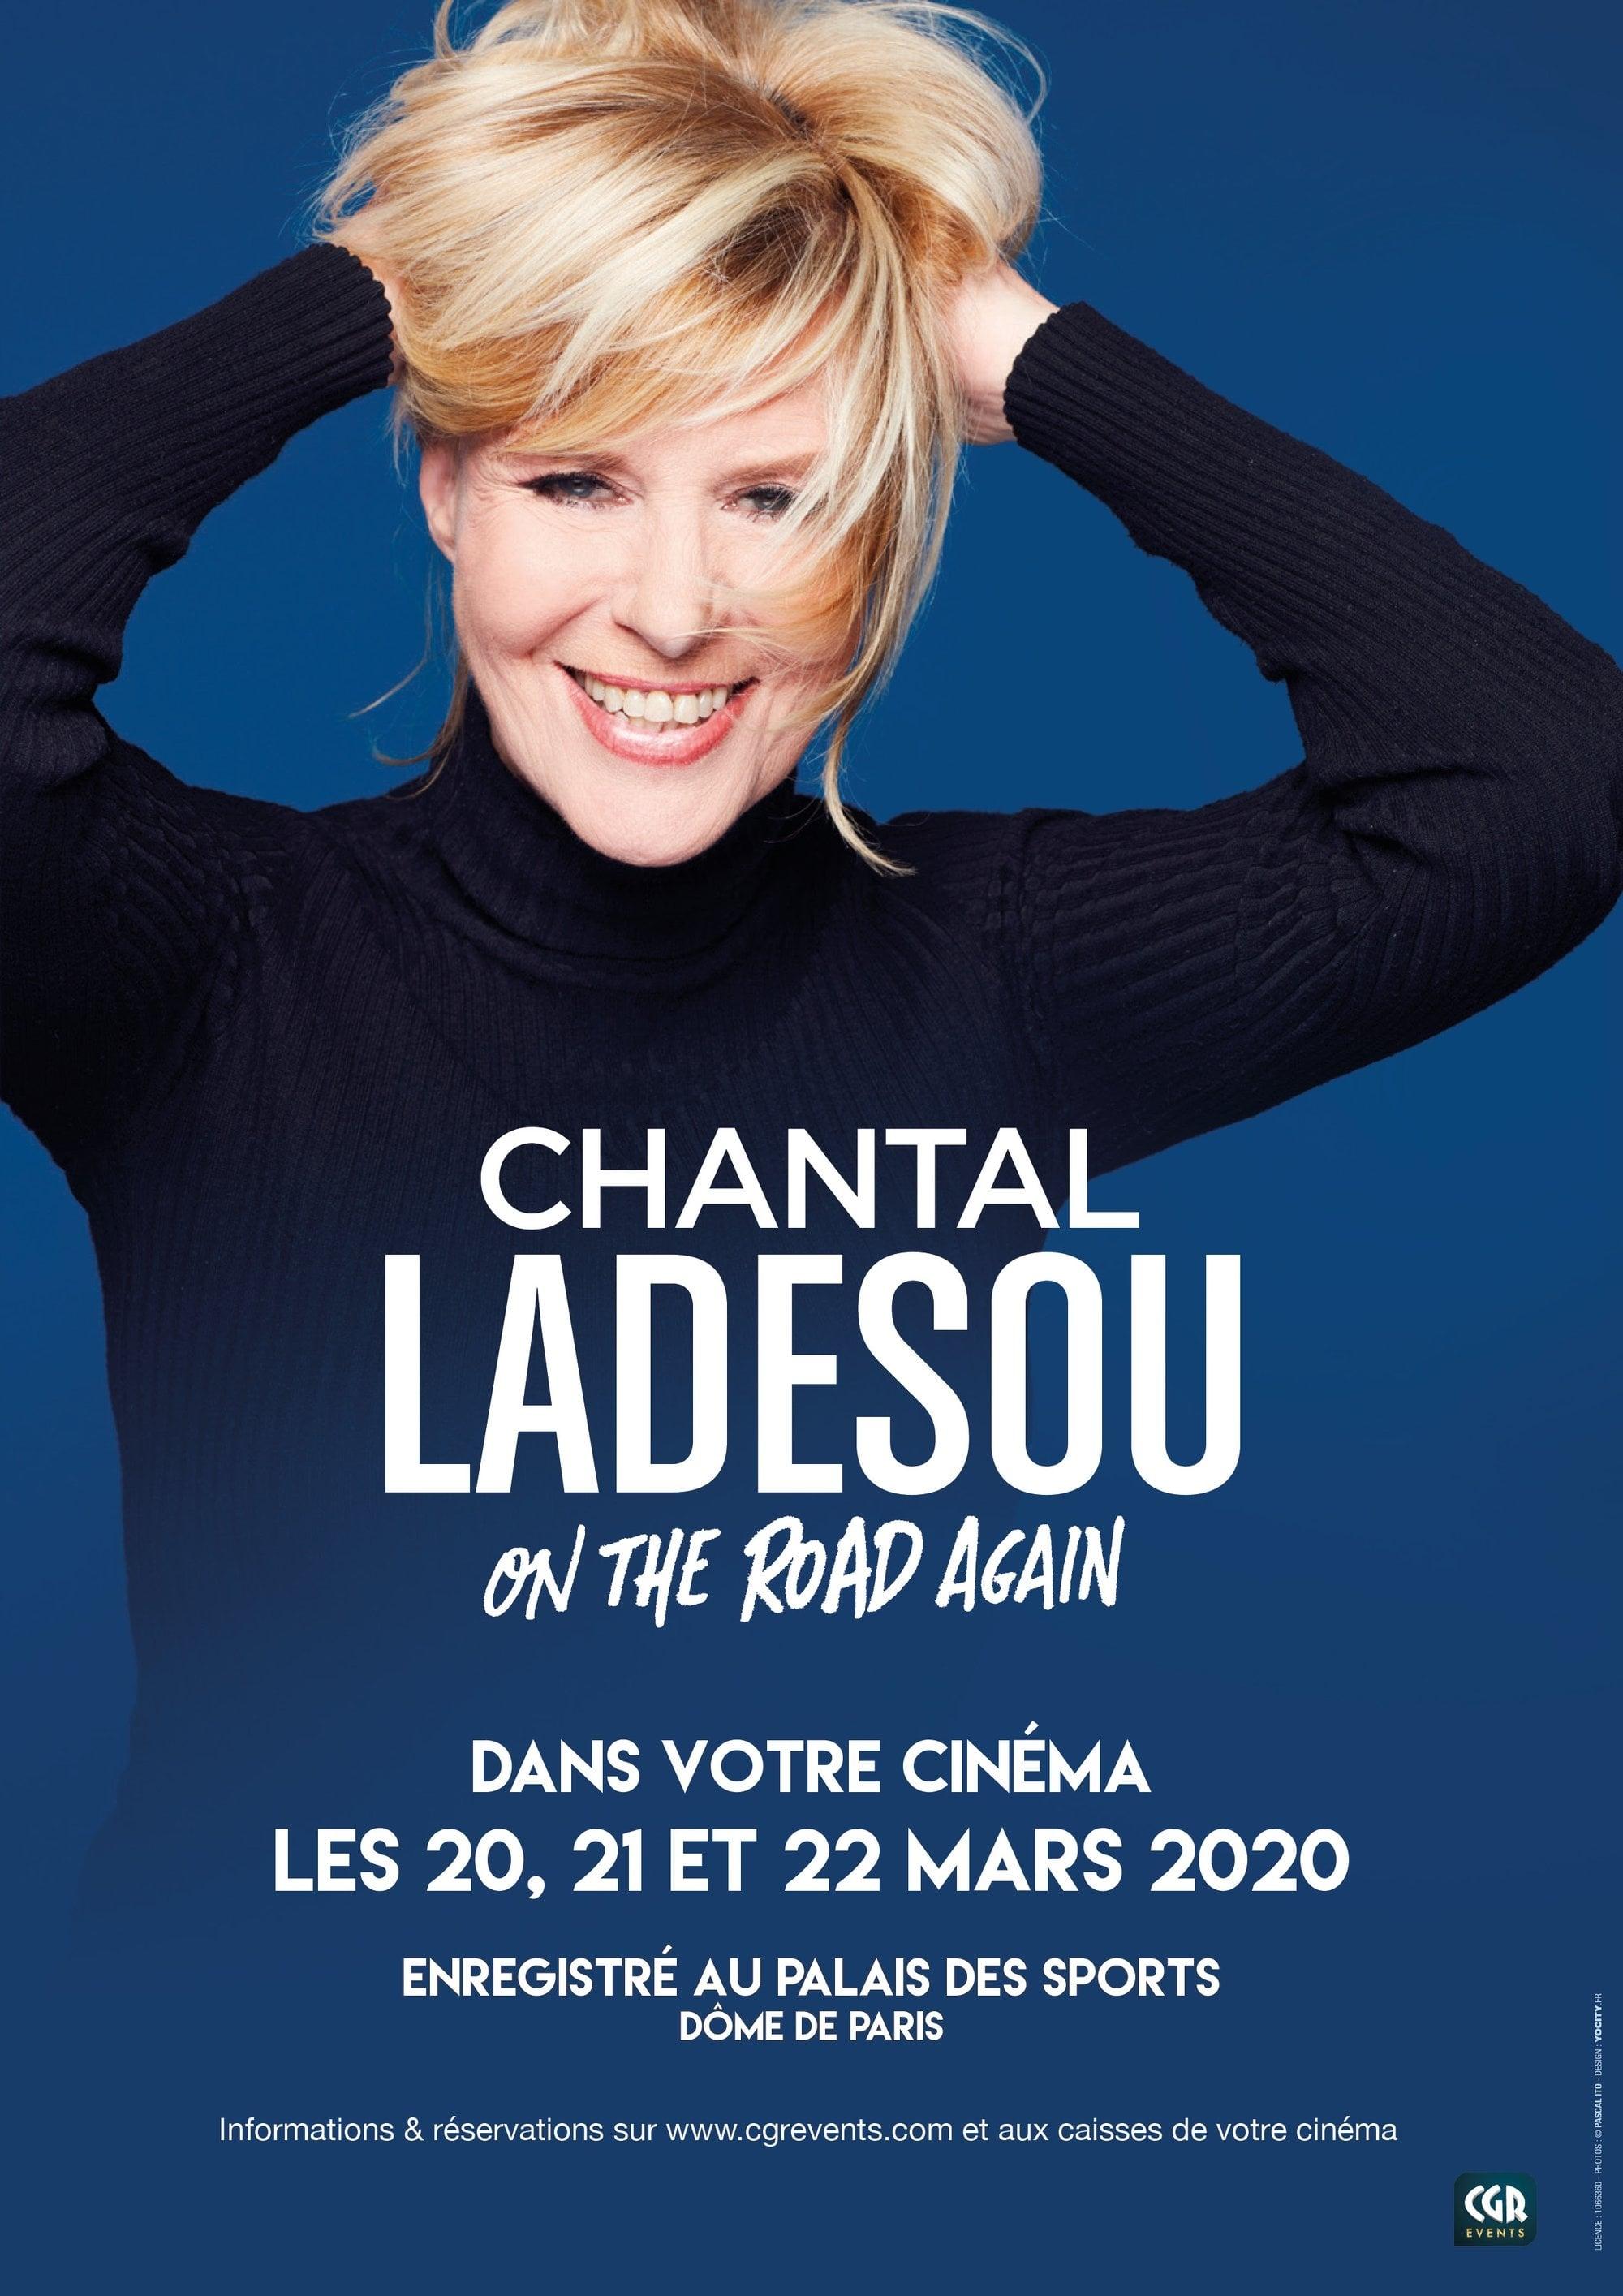 Chantal Ladesou – On the road again